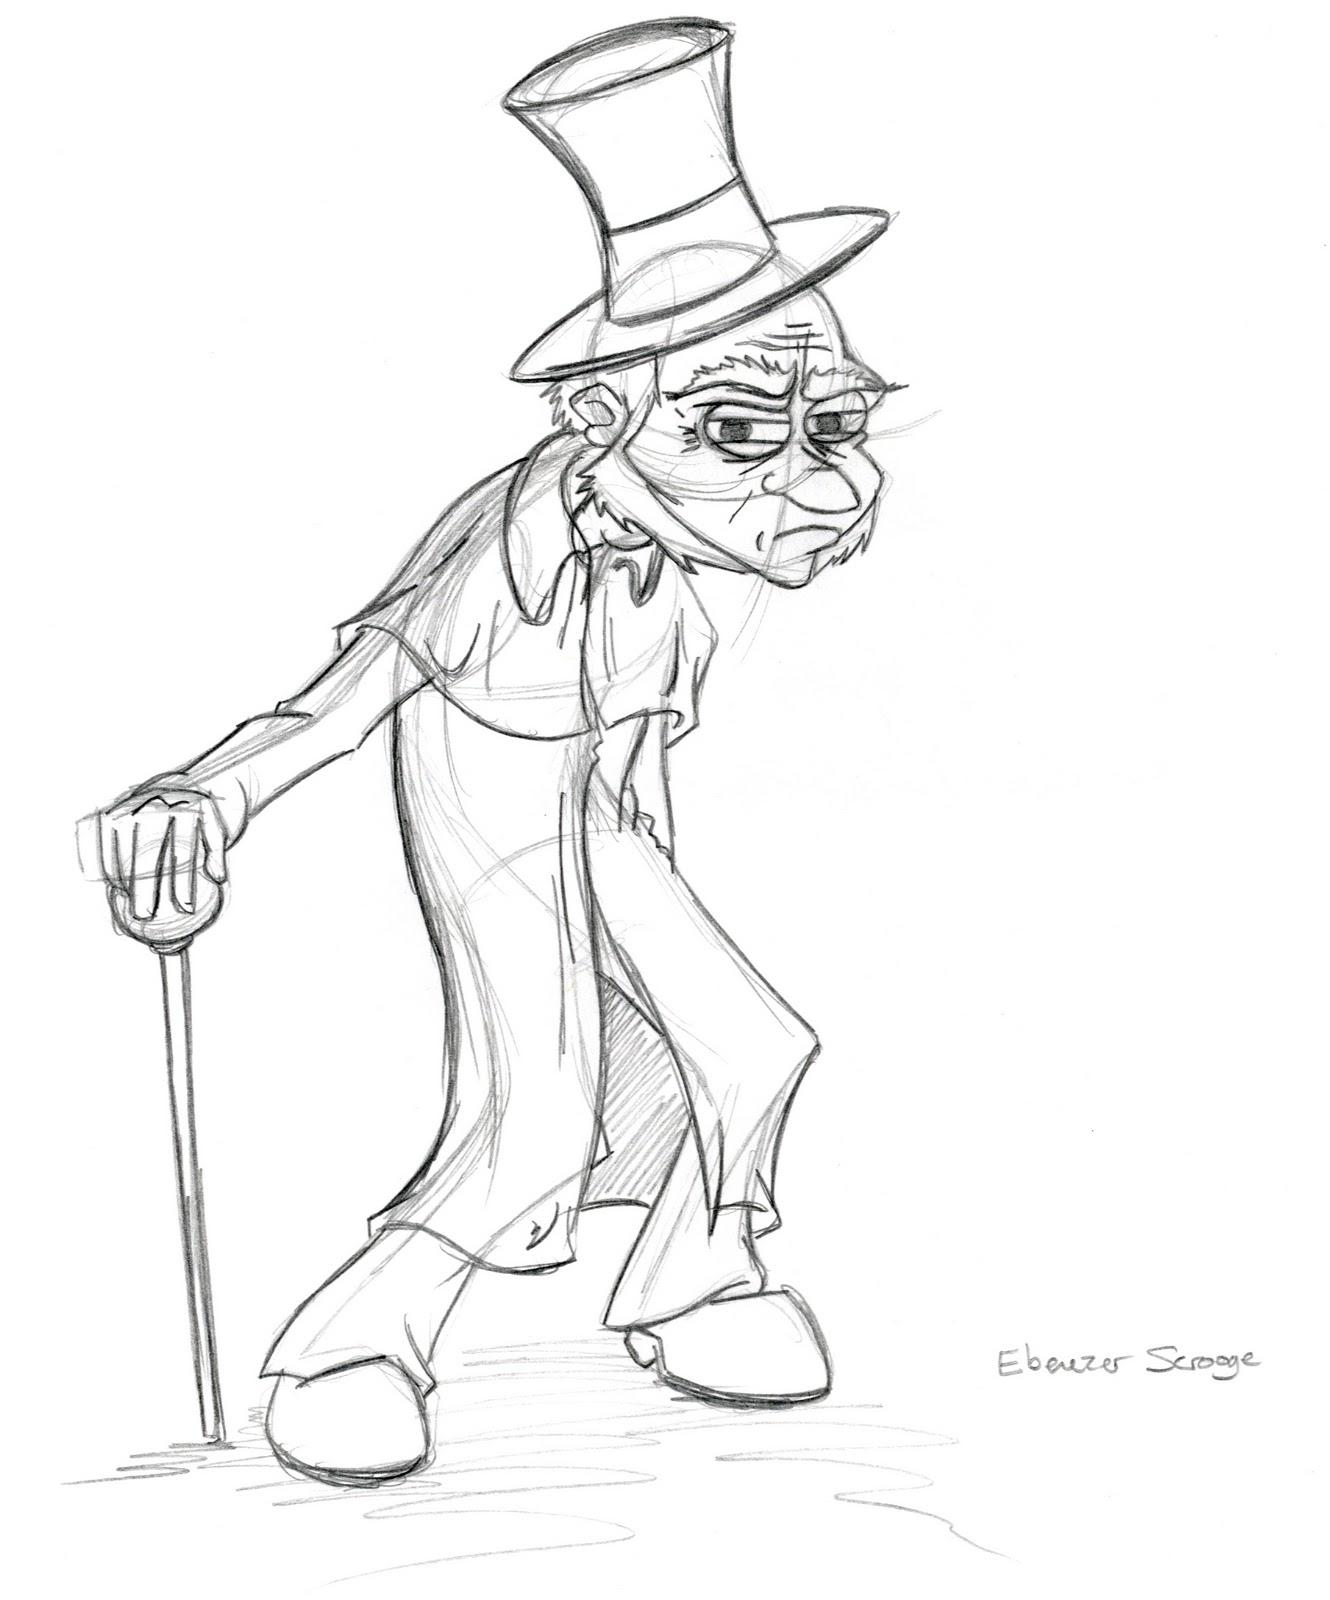 Ebenezer Scrooge Christmas Carol Characters.Ebenezer Scrooge Drawing At Getdrawings Com Free For